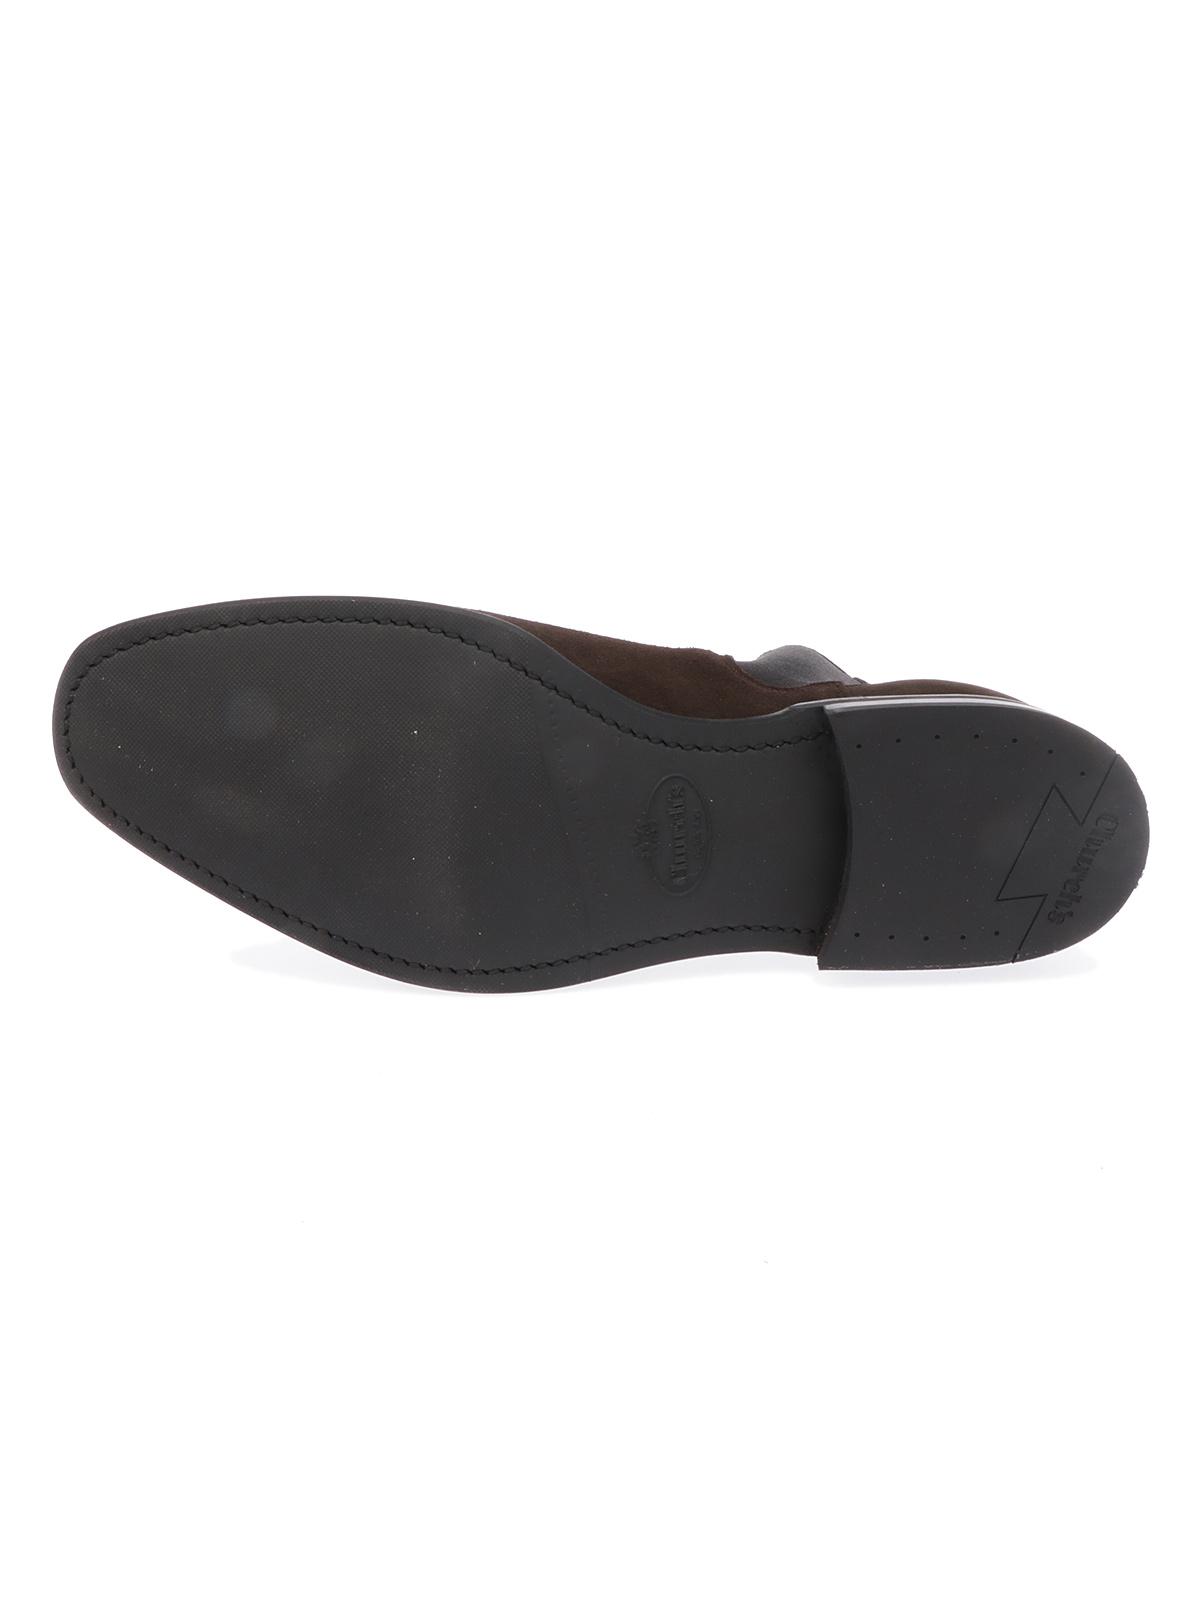 Picture of CHURCH'S | Men's Prenton Chelsea Boot